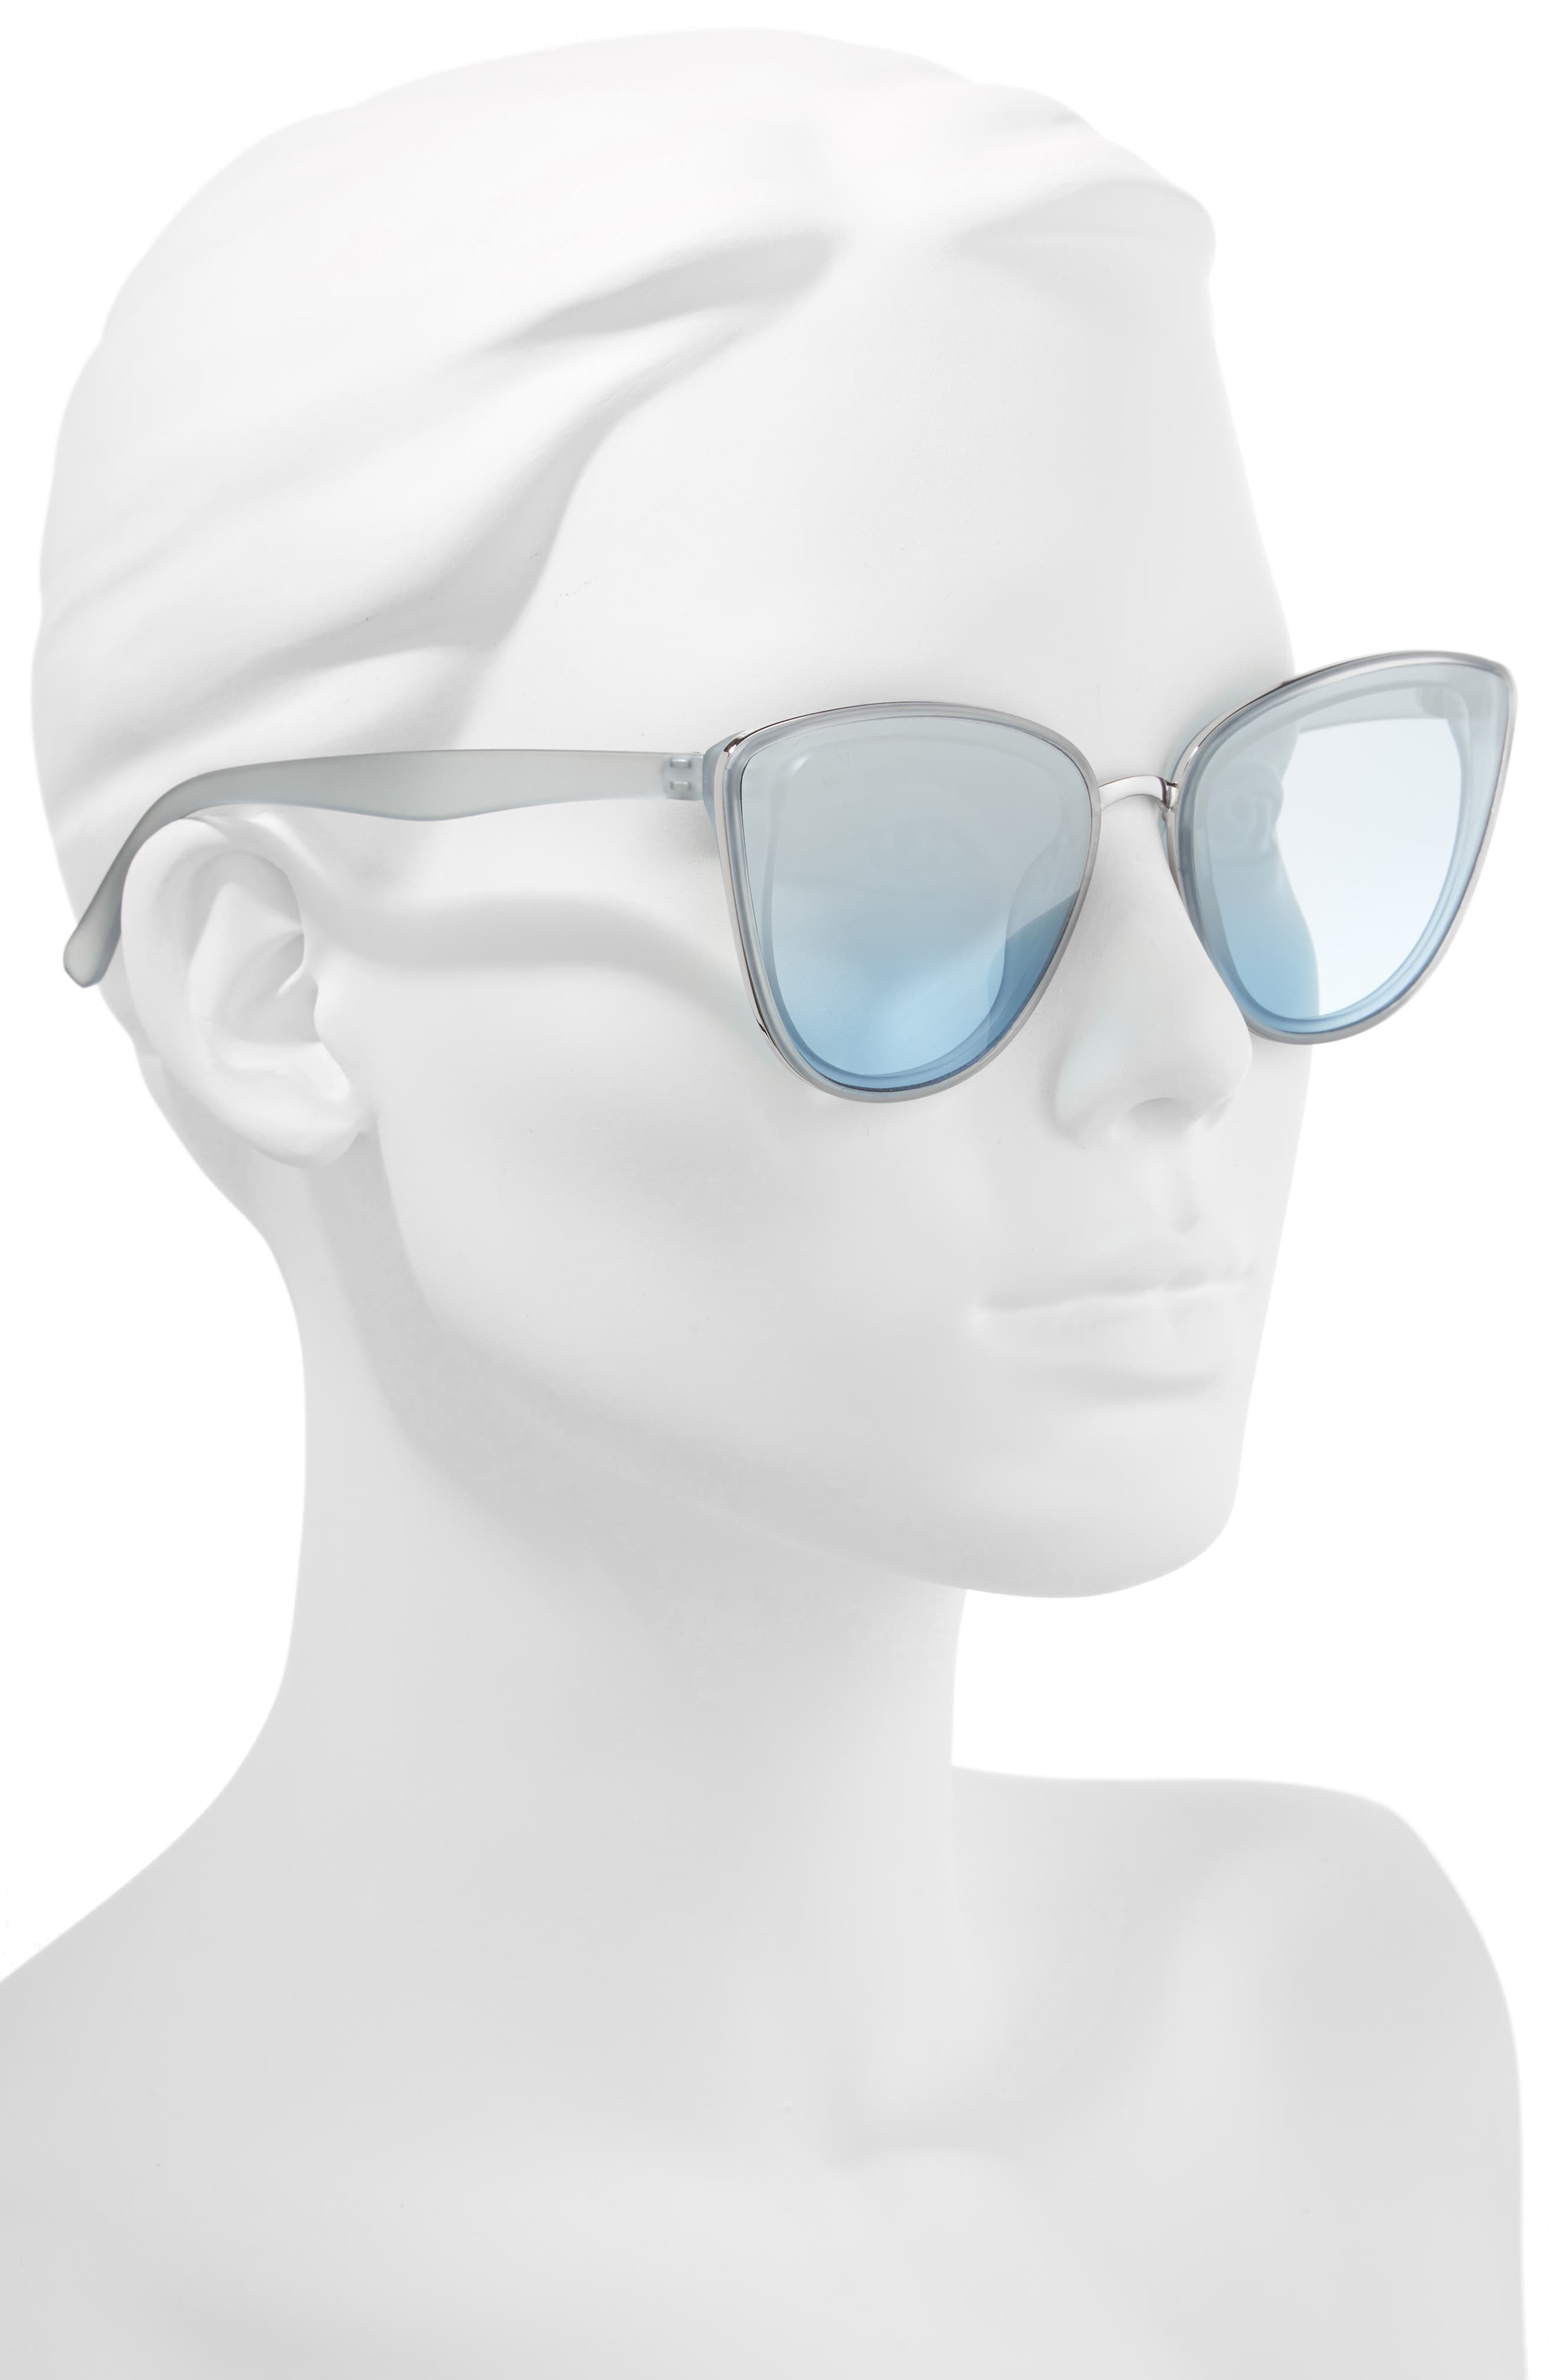 59mm Perfect Cat Eye Sunglasses,                             Alternate thumbnail 2, color,                             Blue/ Blue